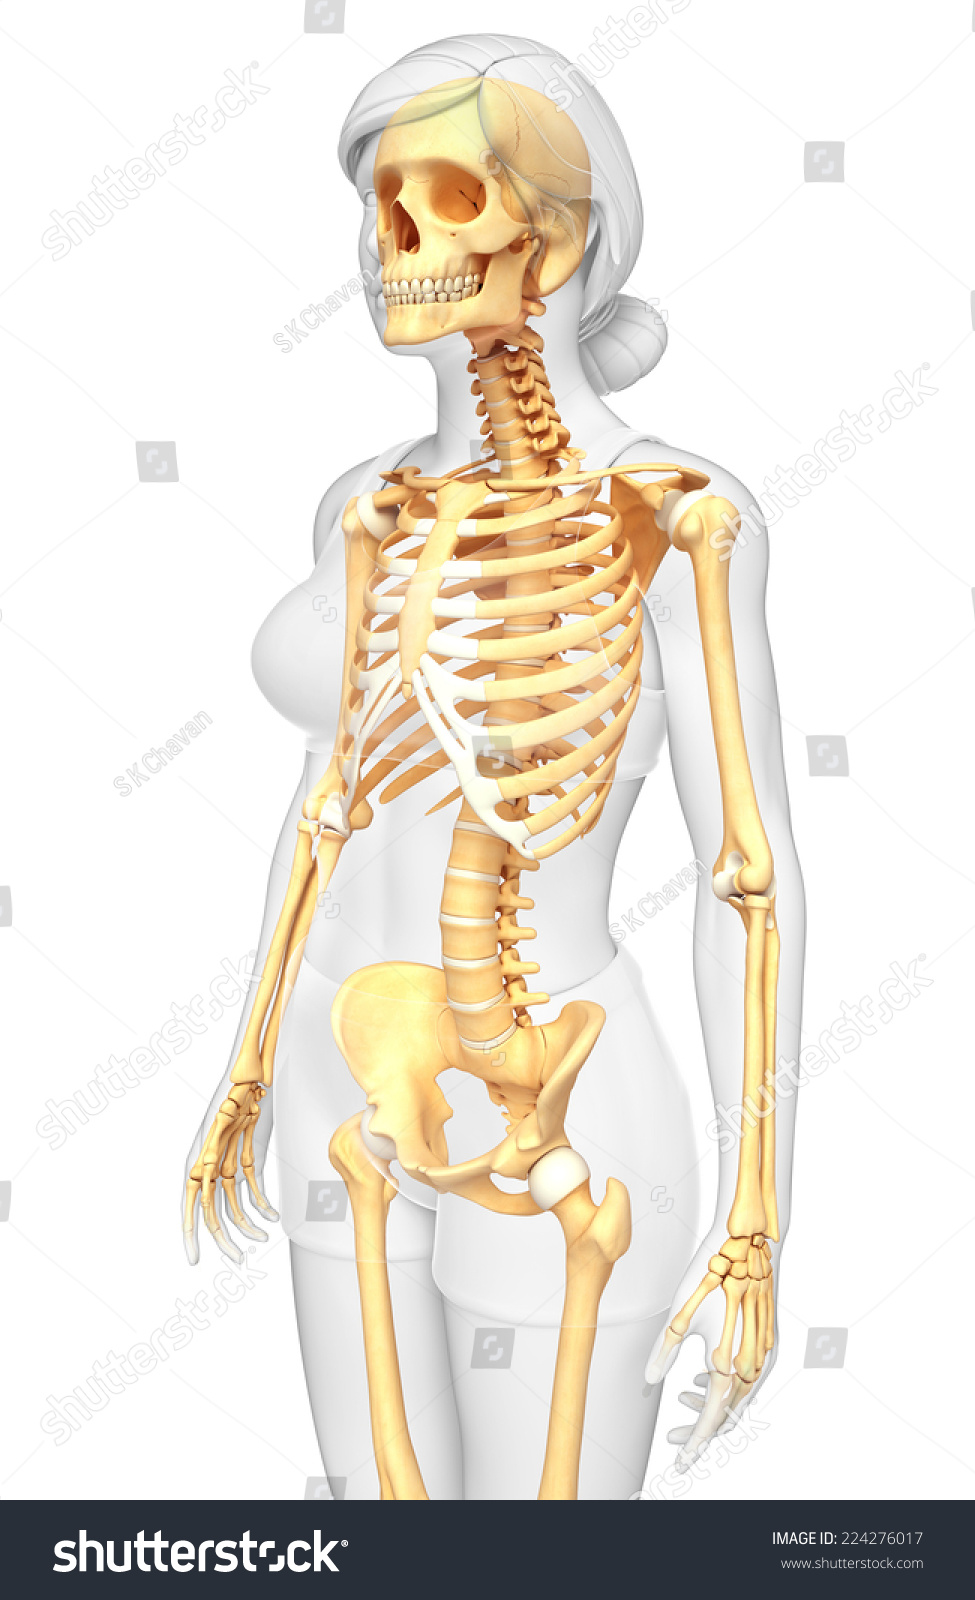 Illustration Human Skeleton Side View Stock Illustration 224276017